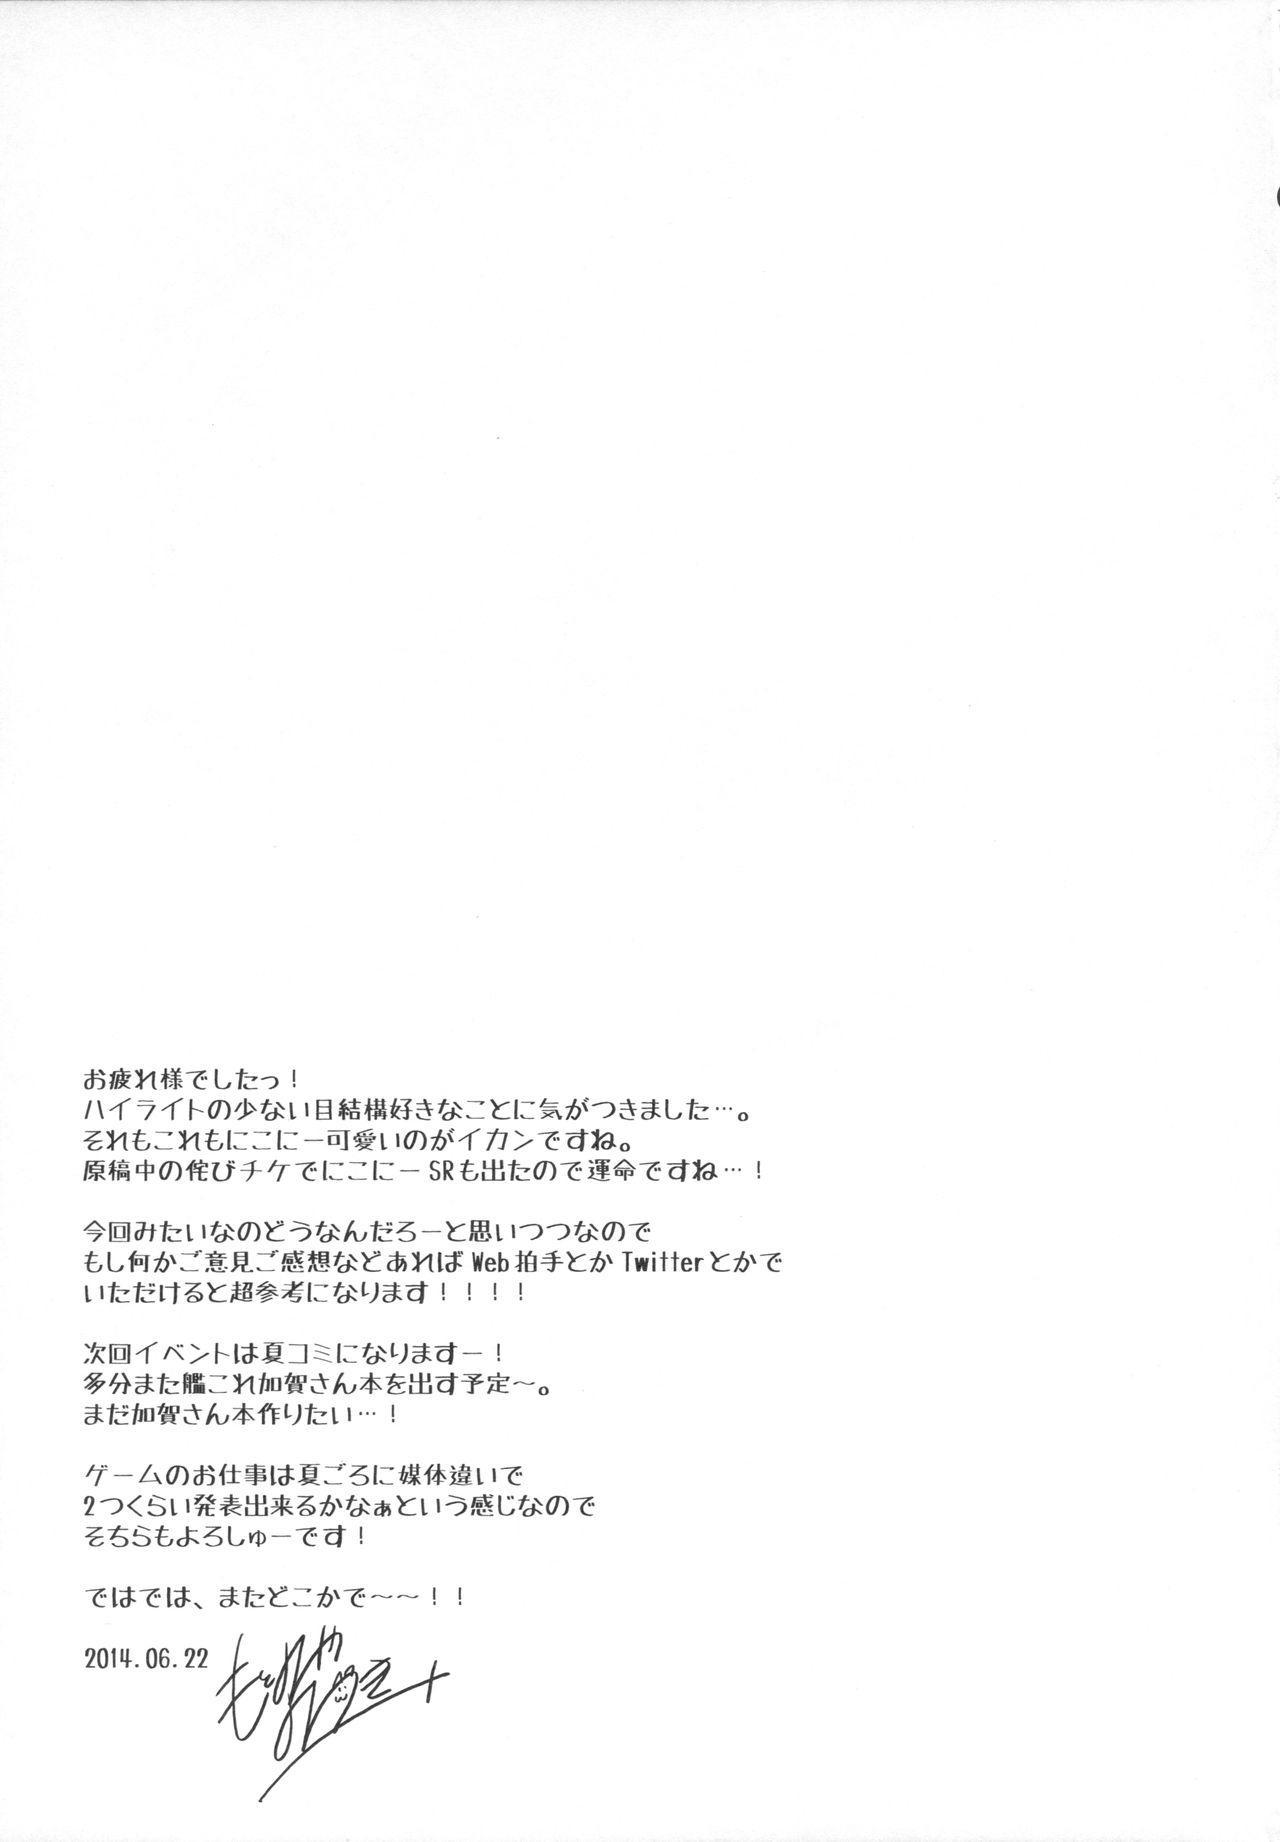 (SC64) [FRAC (Motomiya Mitsuki)] Nico Satsu - Nico-nii Okusuri Ecchi - (Love Live!) [Chinese] [嗶咔嗶咔漢化組] 19